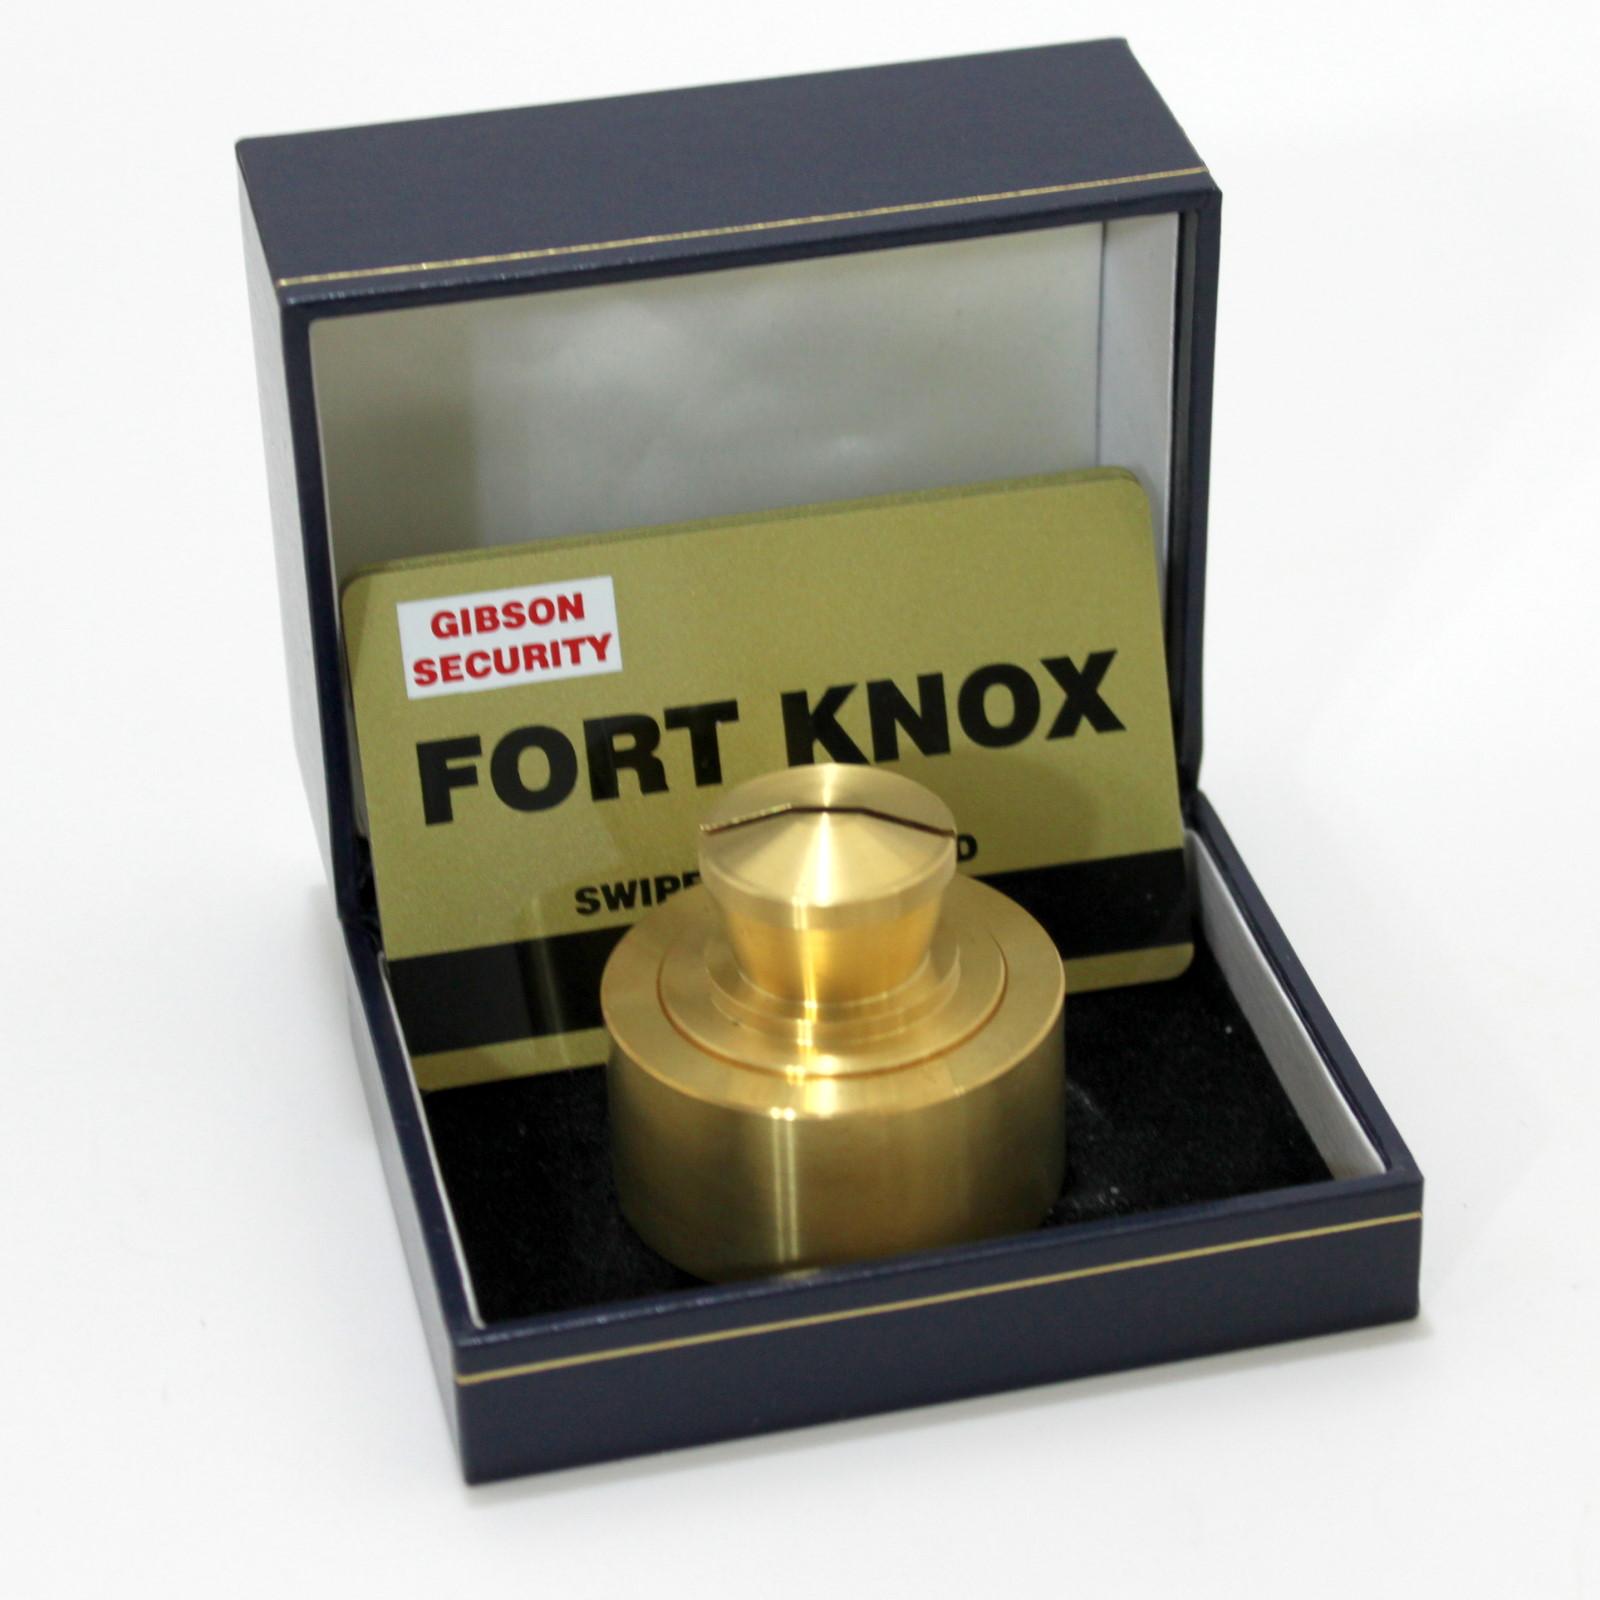 Fort Knox by Eddie Gibson